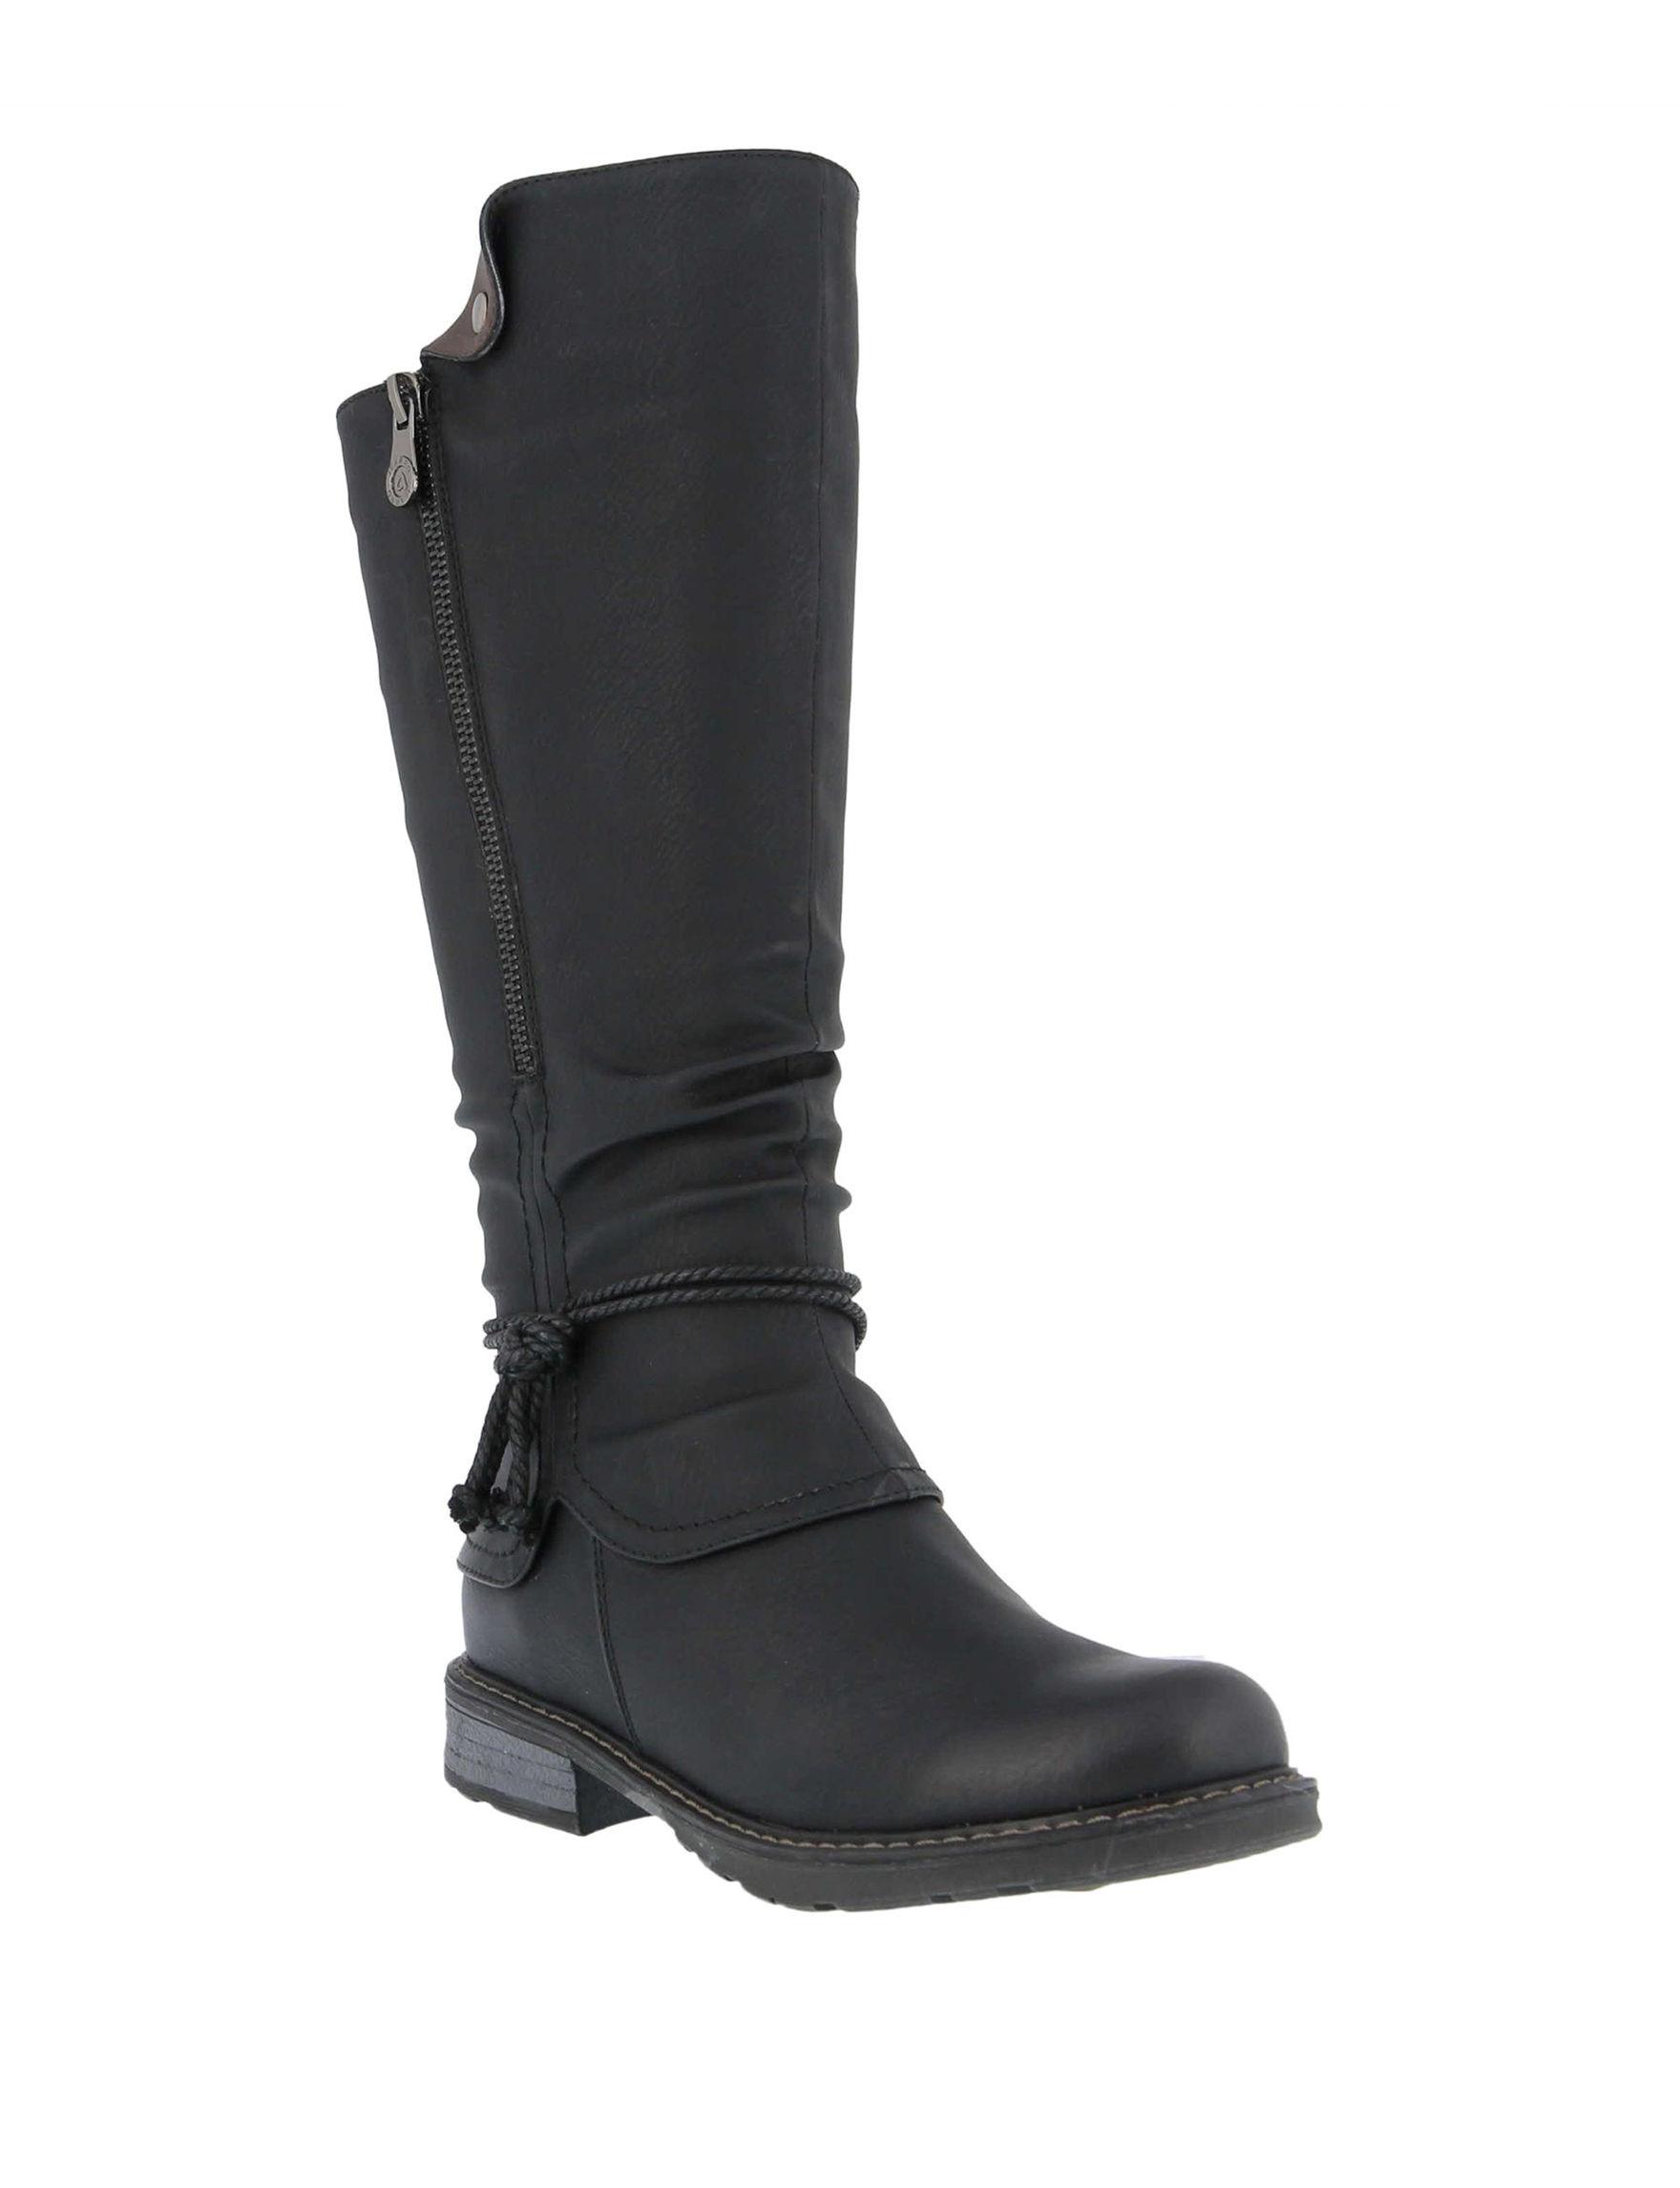 Patrizia Black Riding Boots